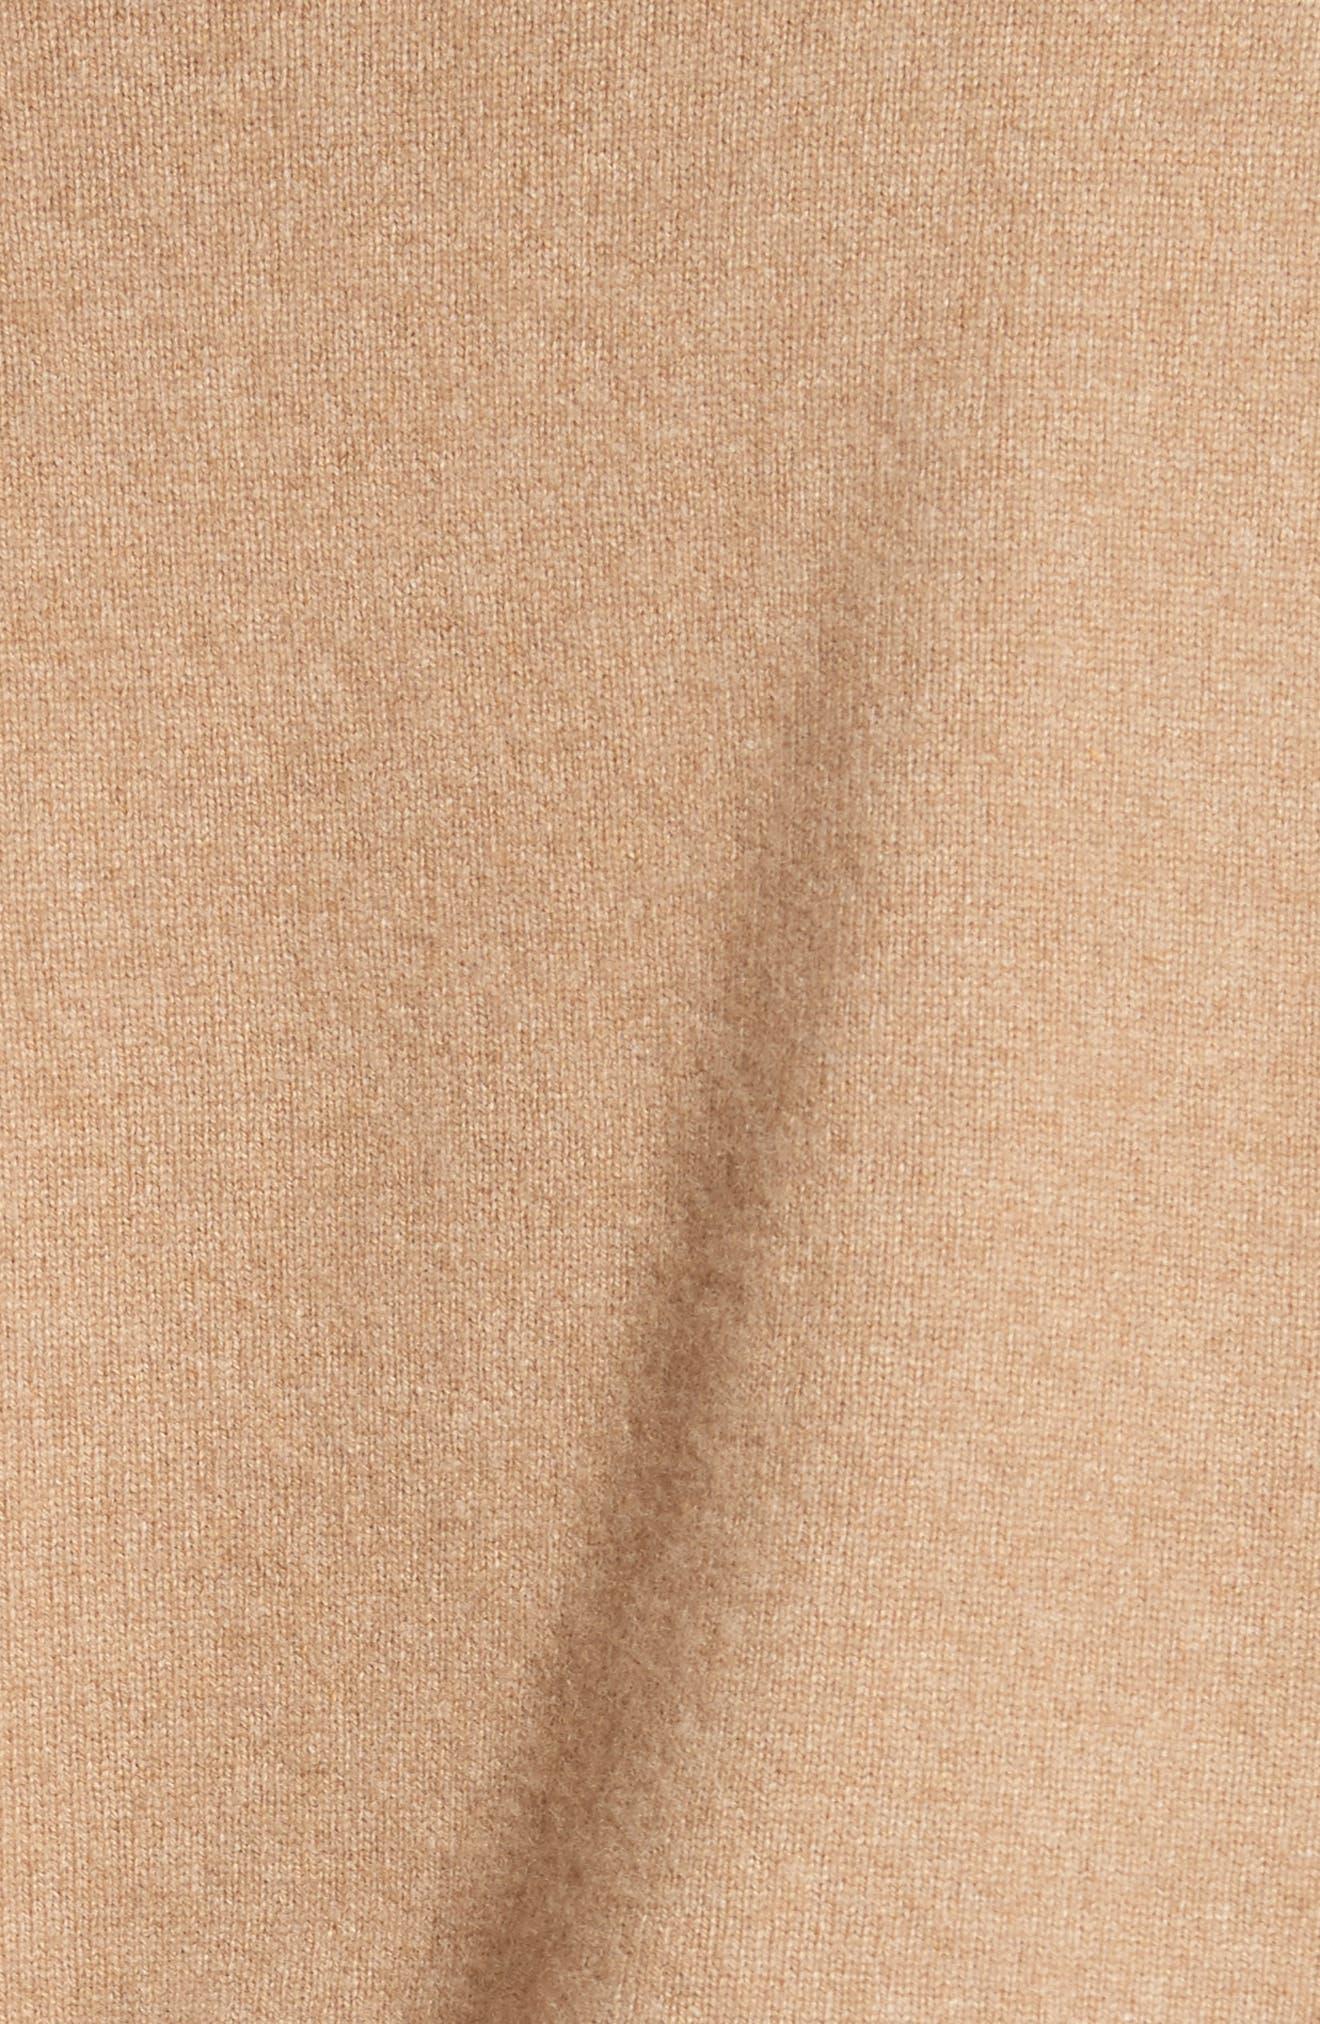 Asymmetrical Wool & Cashmere Blend Sweater Dress,                             Alternate thumbnail 5, color,                             204